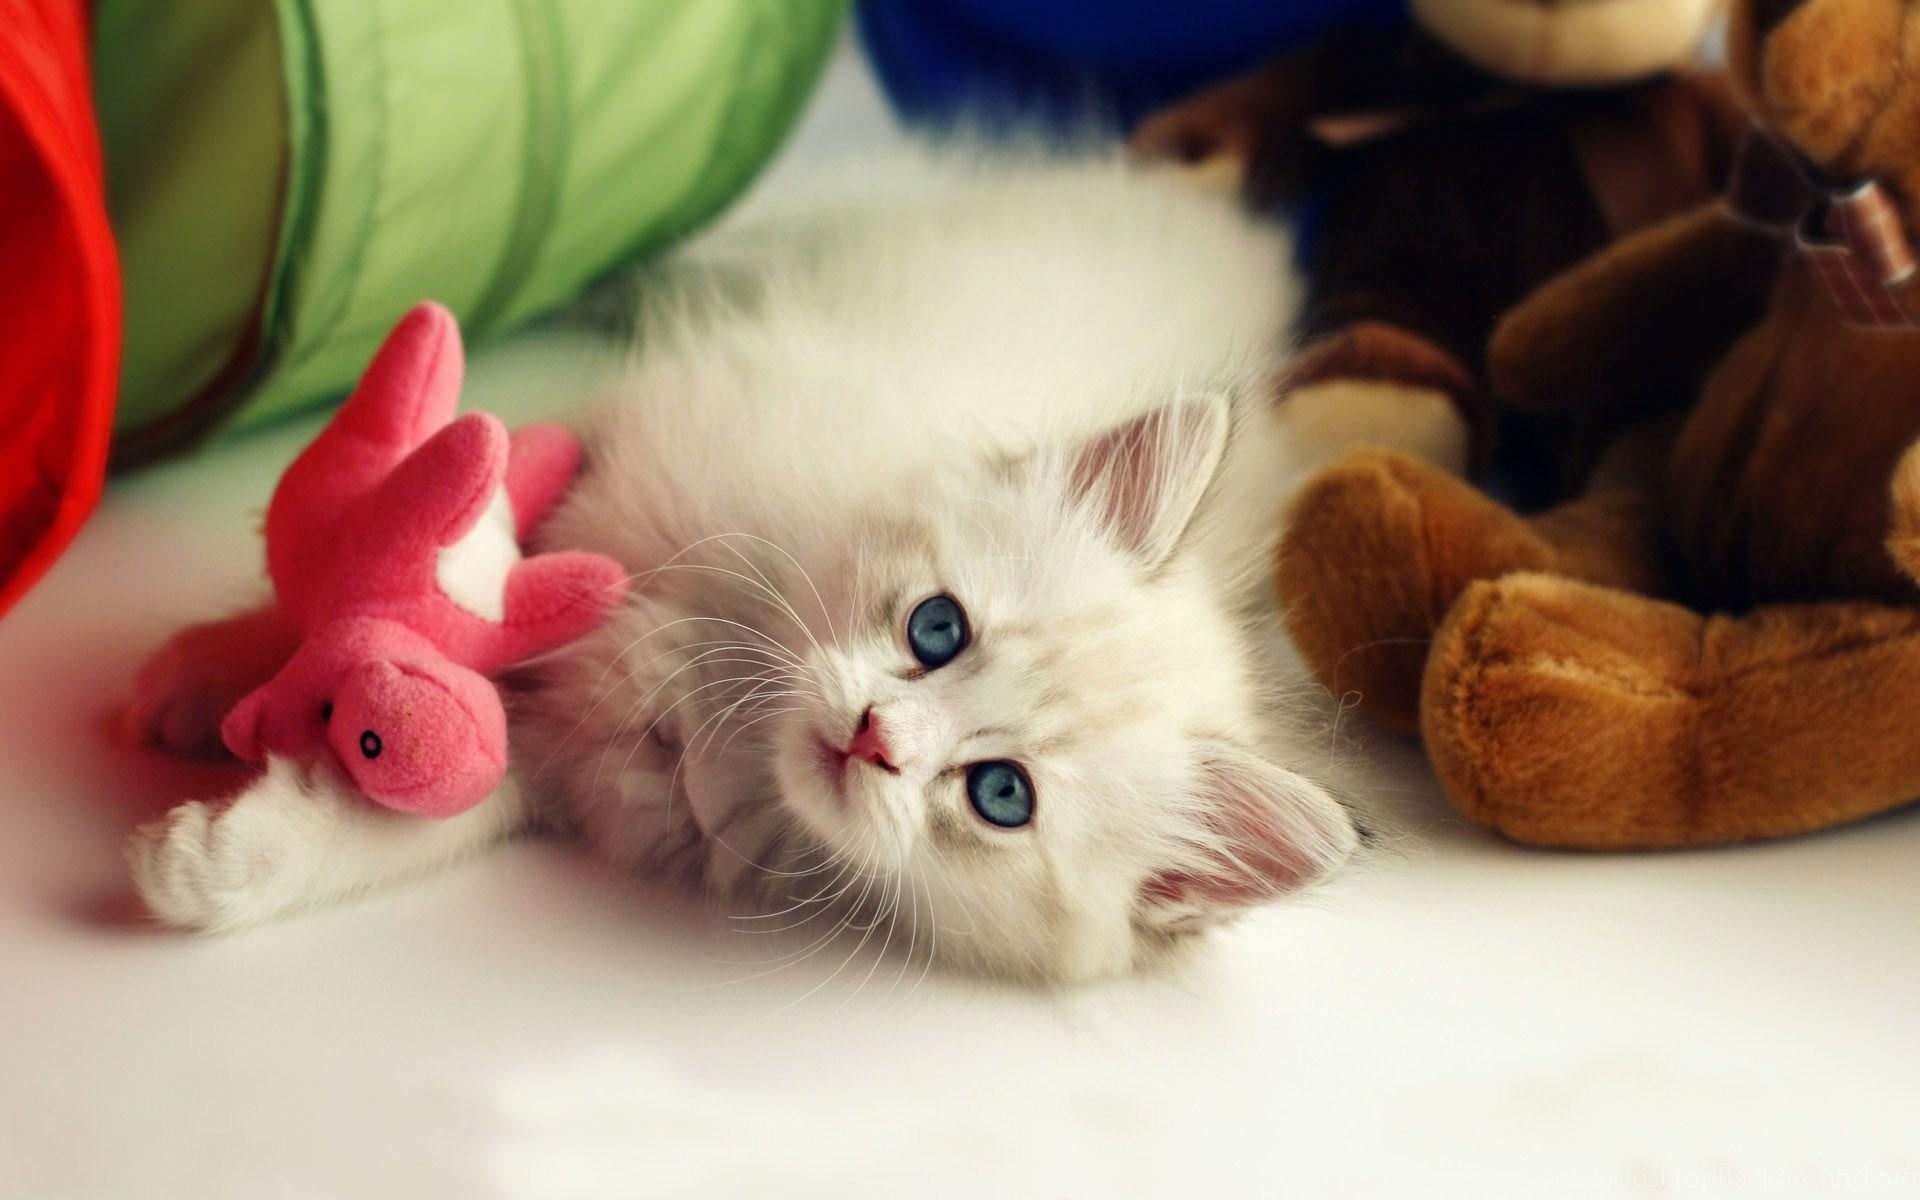 Hd Wallpaper Cute Baby Cat Cute Cat Wallpapers Desktop Background